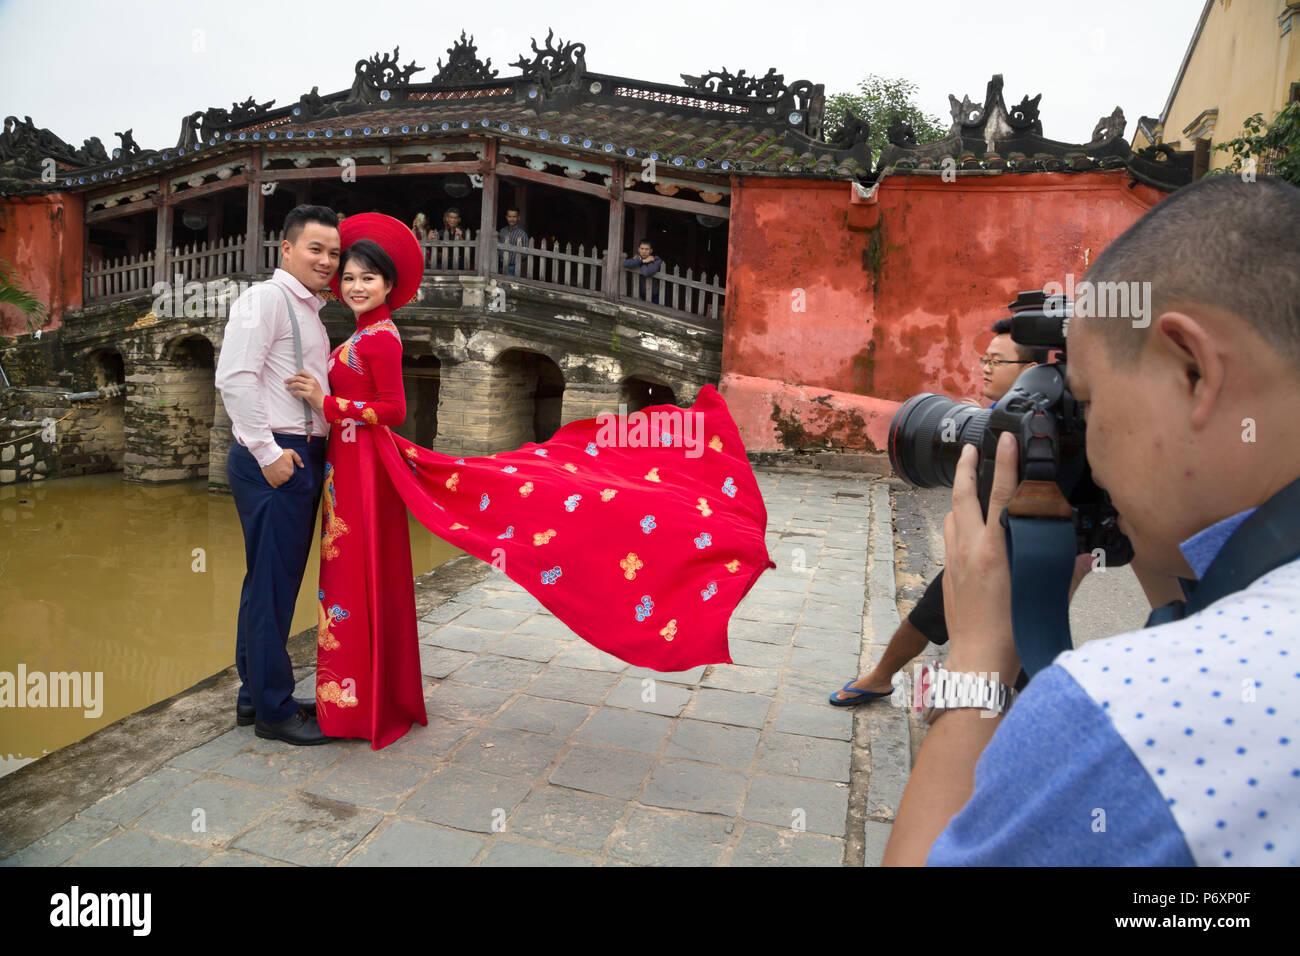 Foto Session vor der japanischen Brücke abgedeckt, Hoi An, Vietnam Stockbild